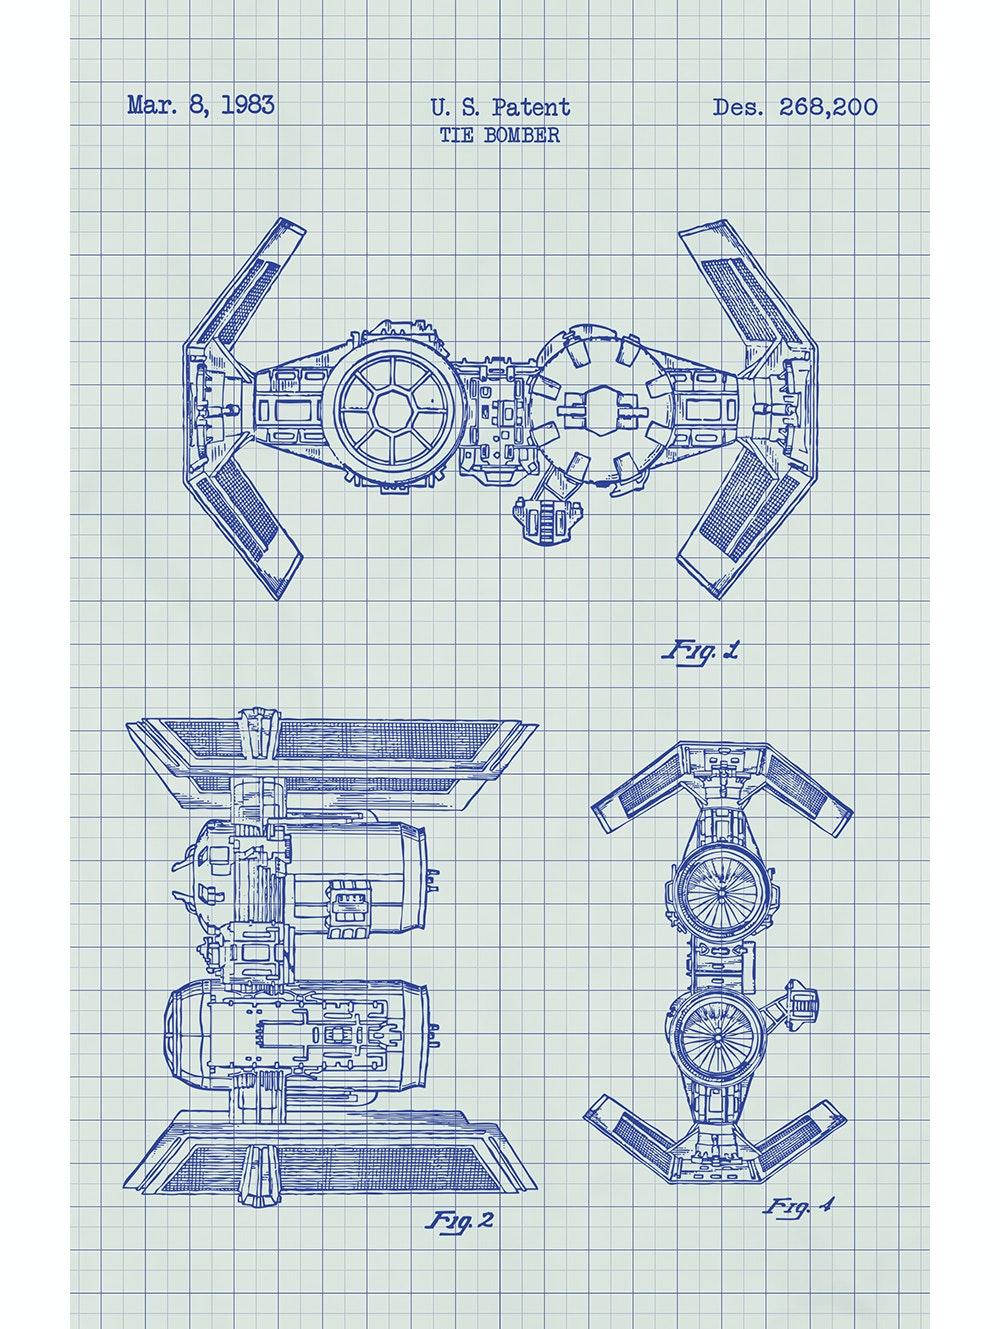 Star Wars - Tie Bomber - 268,200